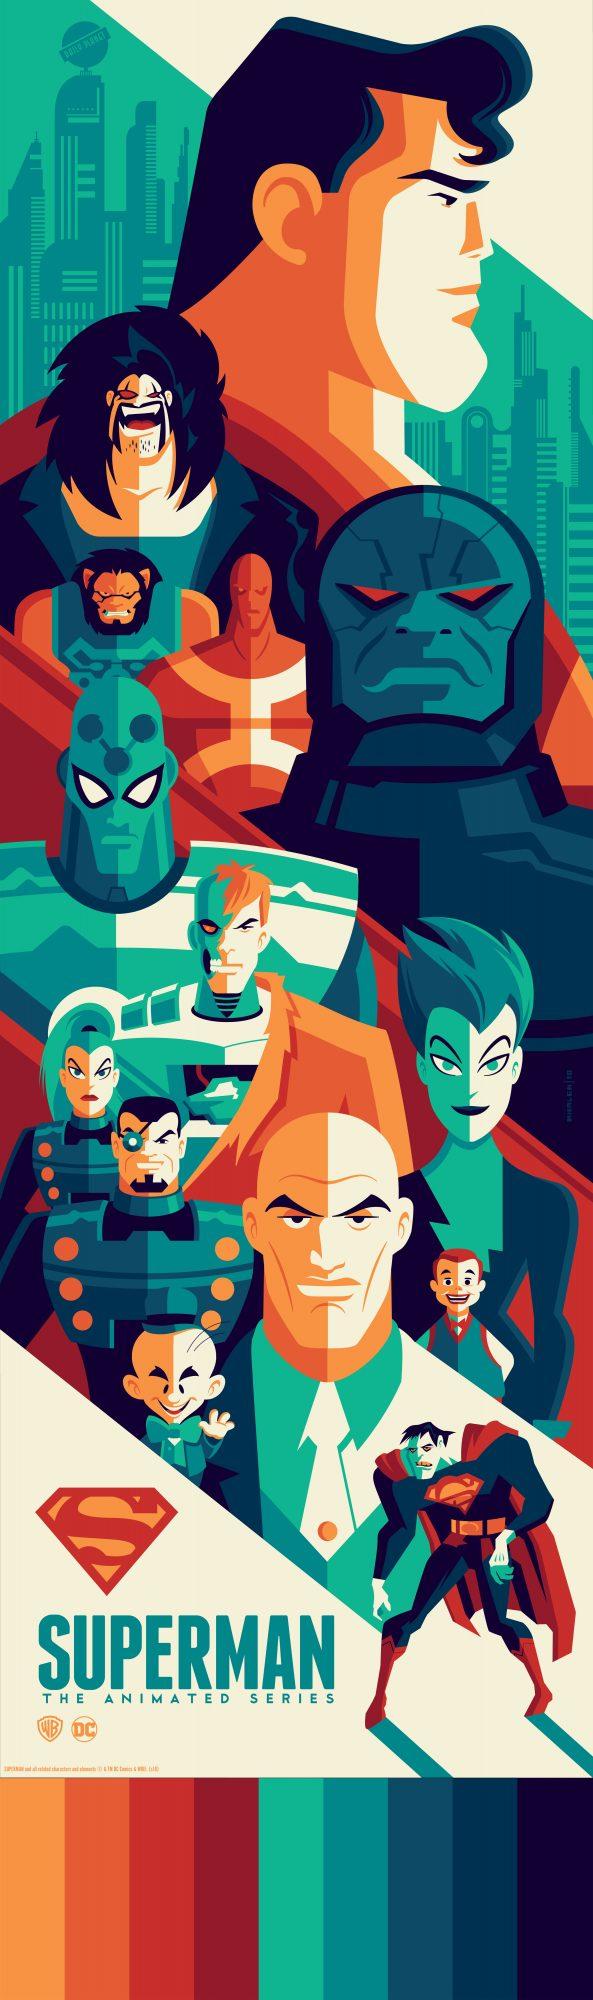 "Tom Whalen ""Superman: The Animated Series"" Screen print"